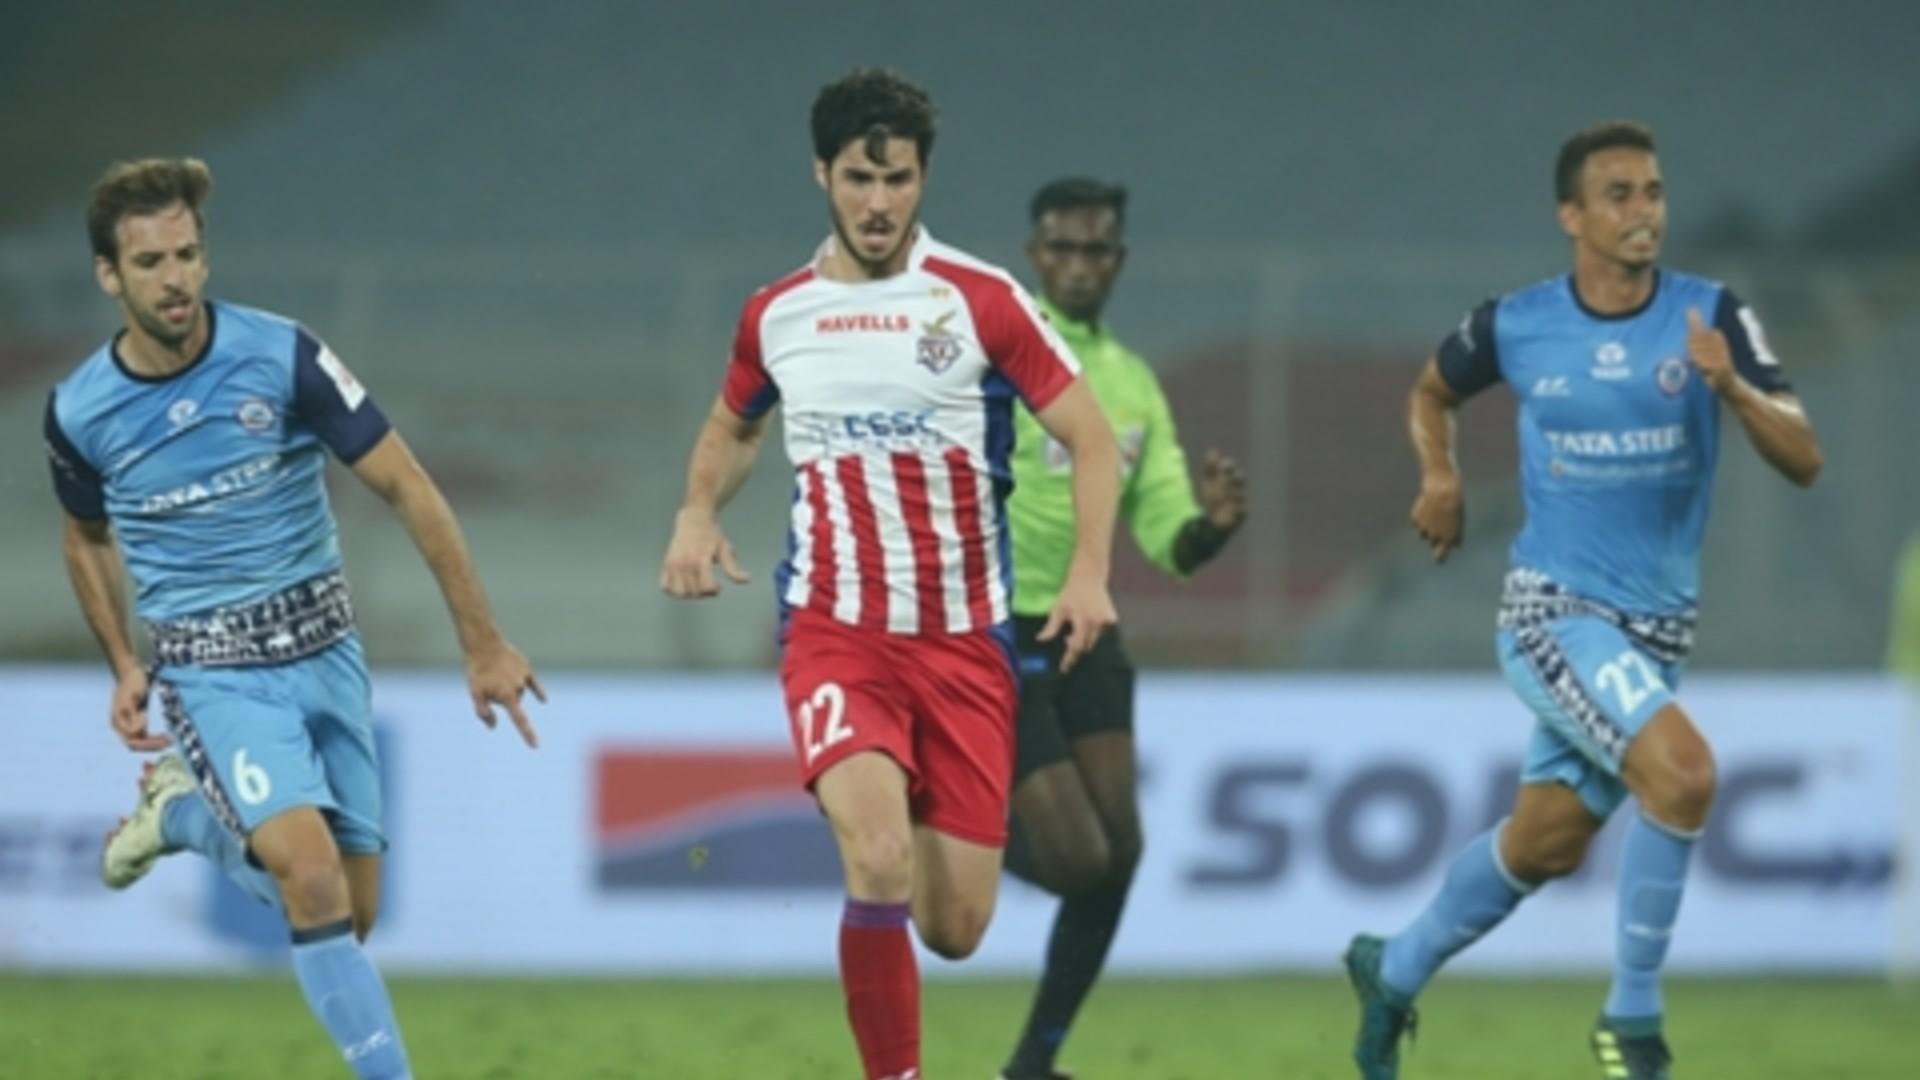 Edu Garcia - ATK Mohun Bagan will be the biggest club in ISL